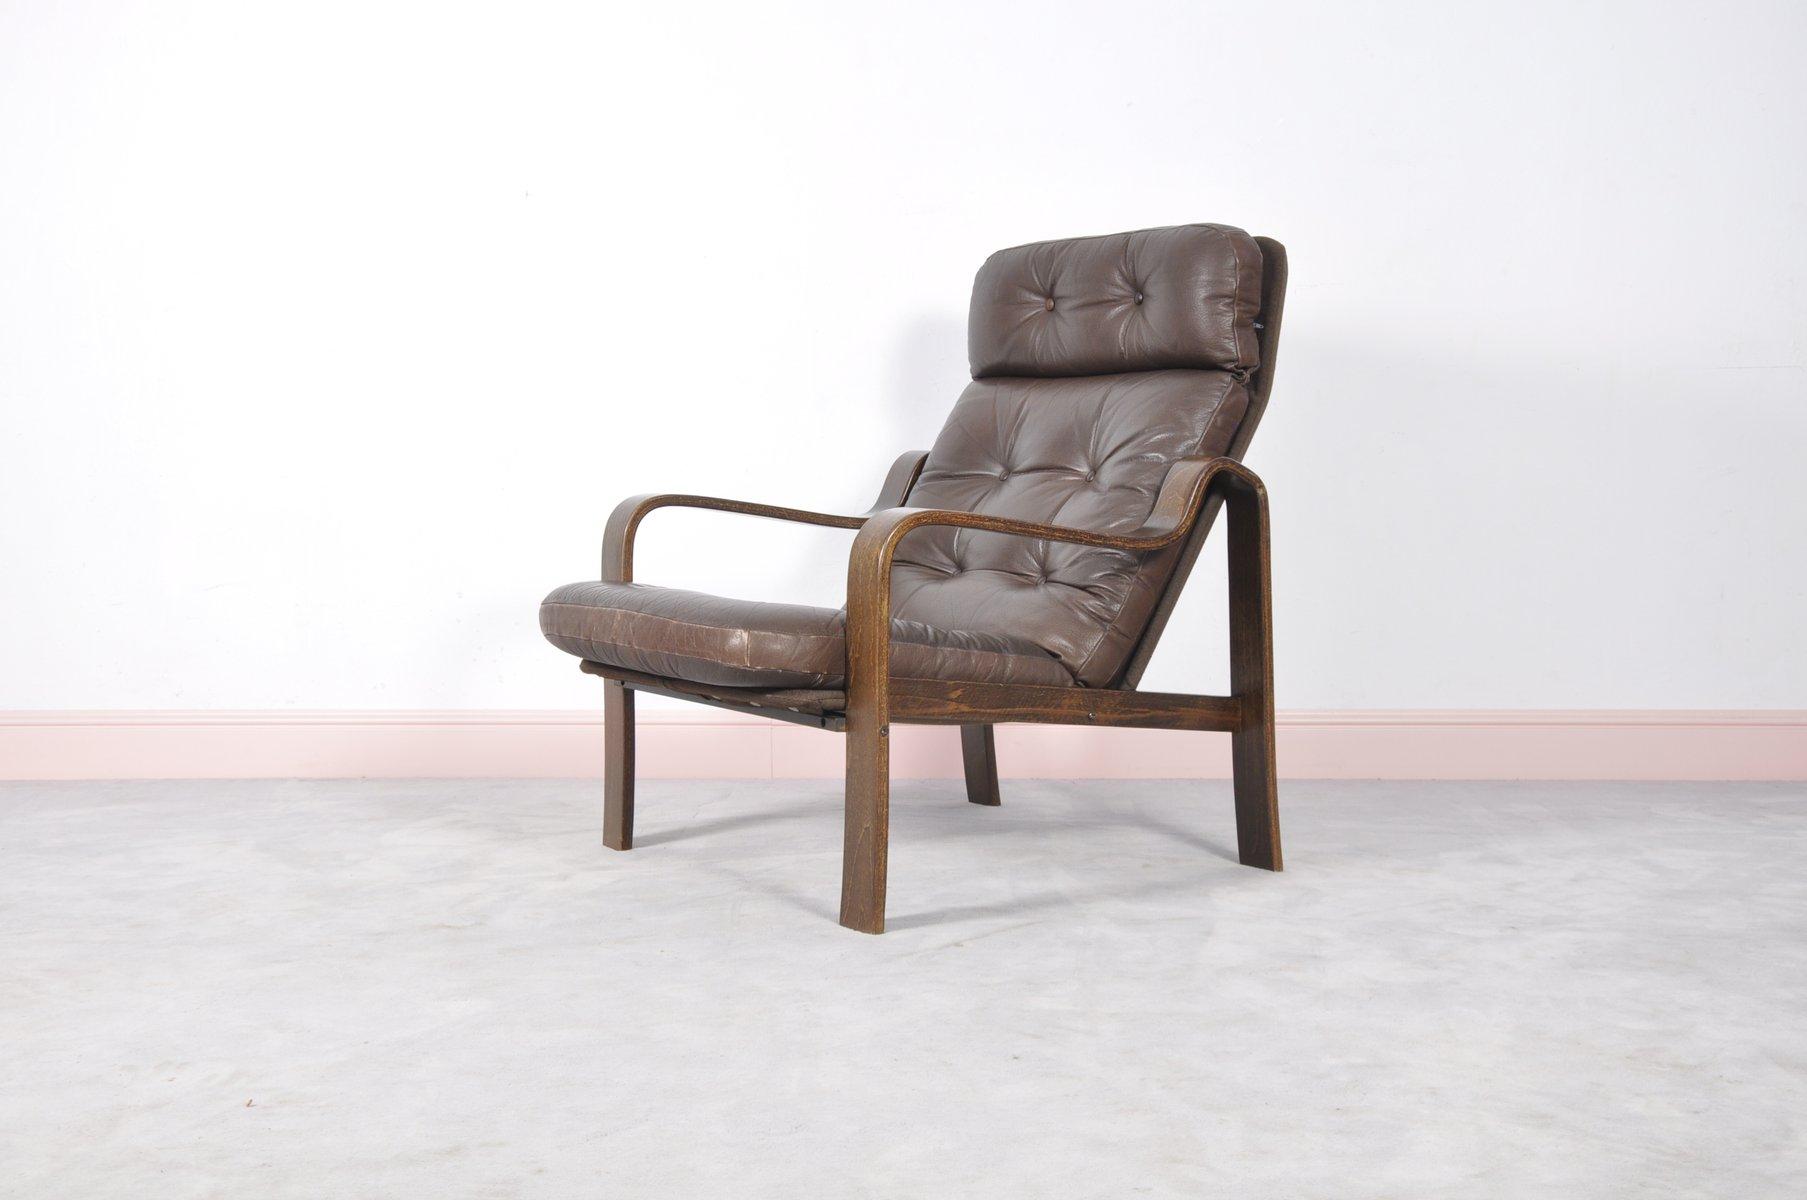 mid century sessel aus palisander leder bugholz bei pamono kaufen. Black Bedroom Furniture Sets. Home Design Ideas